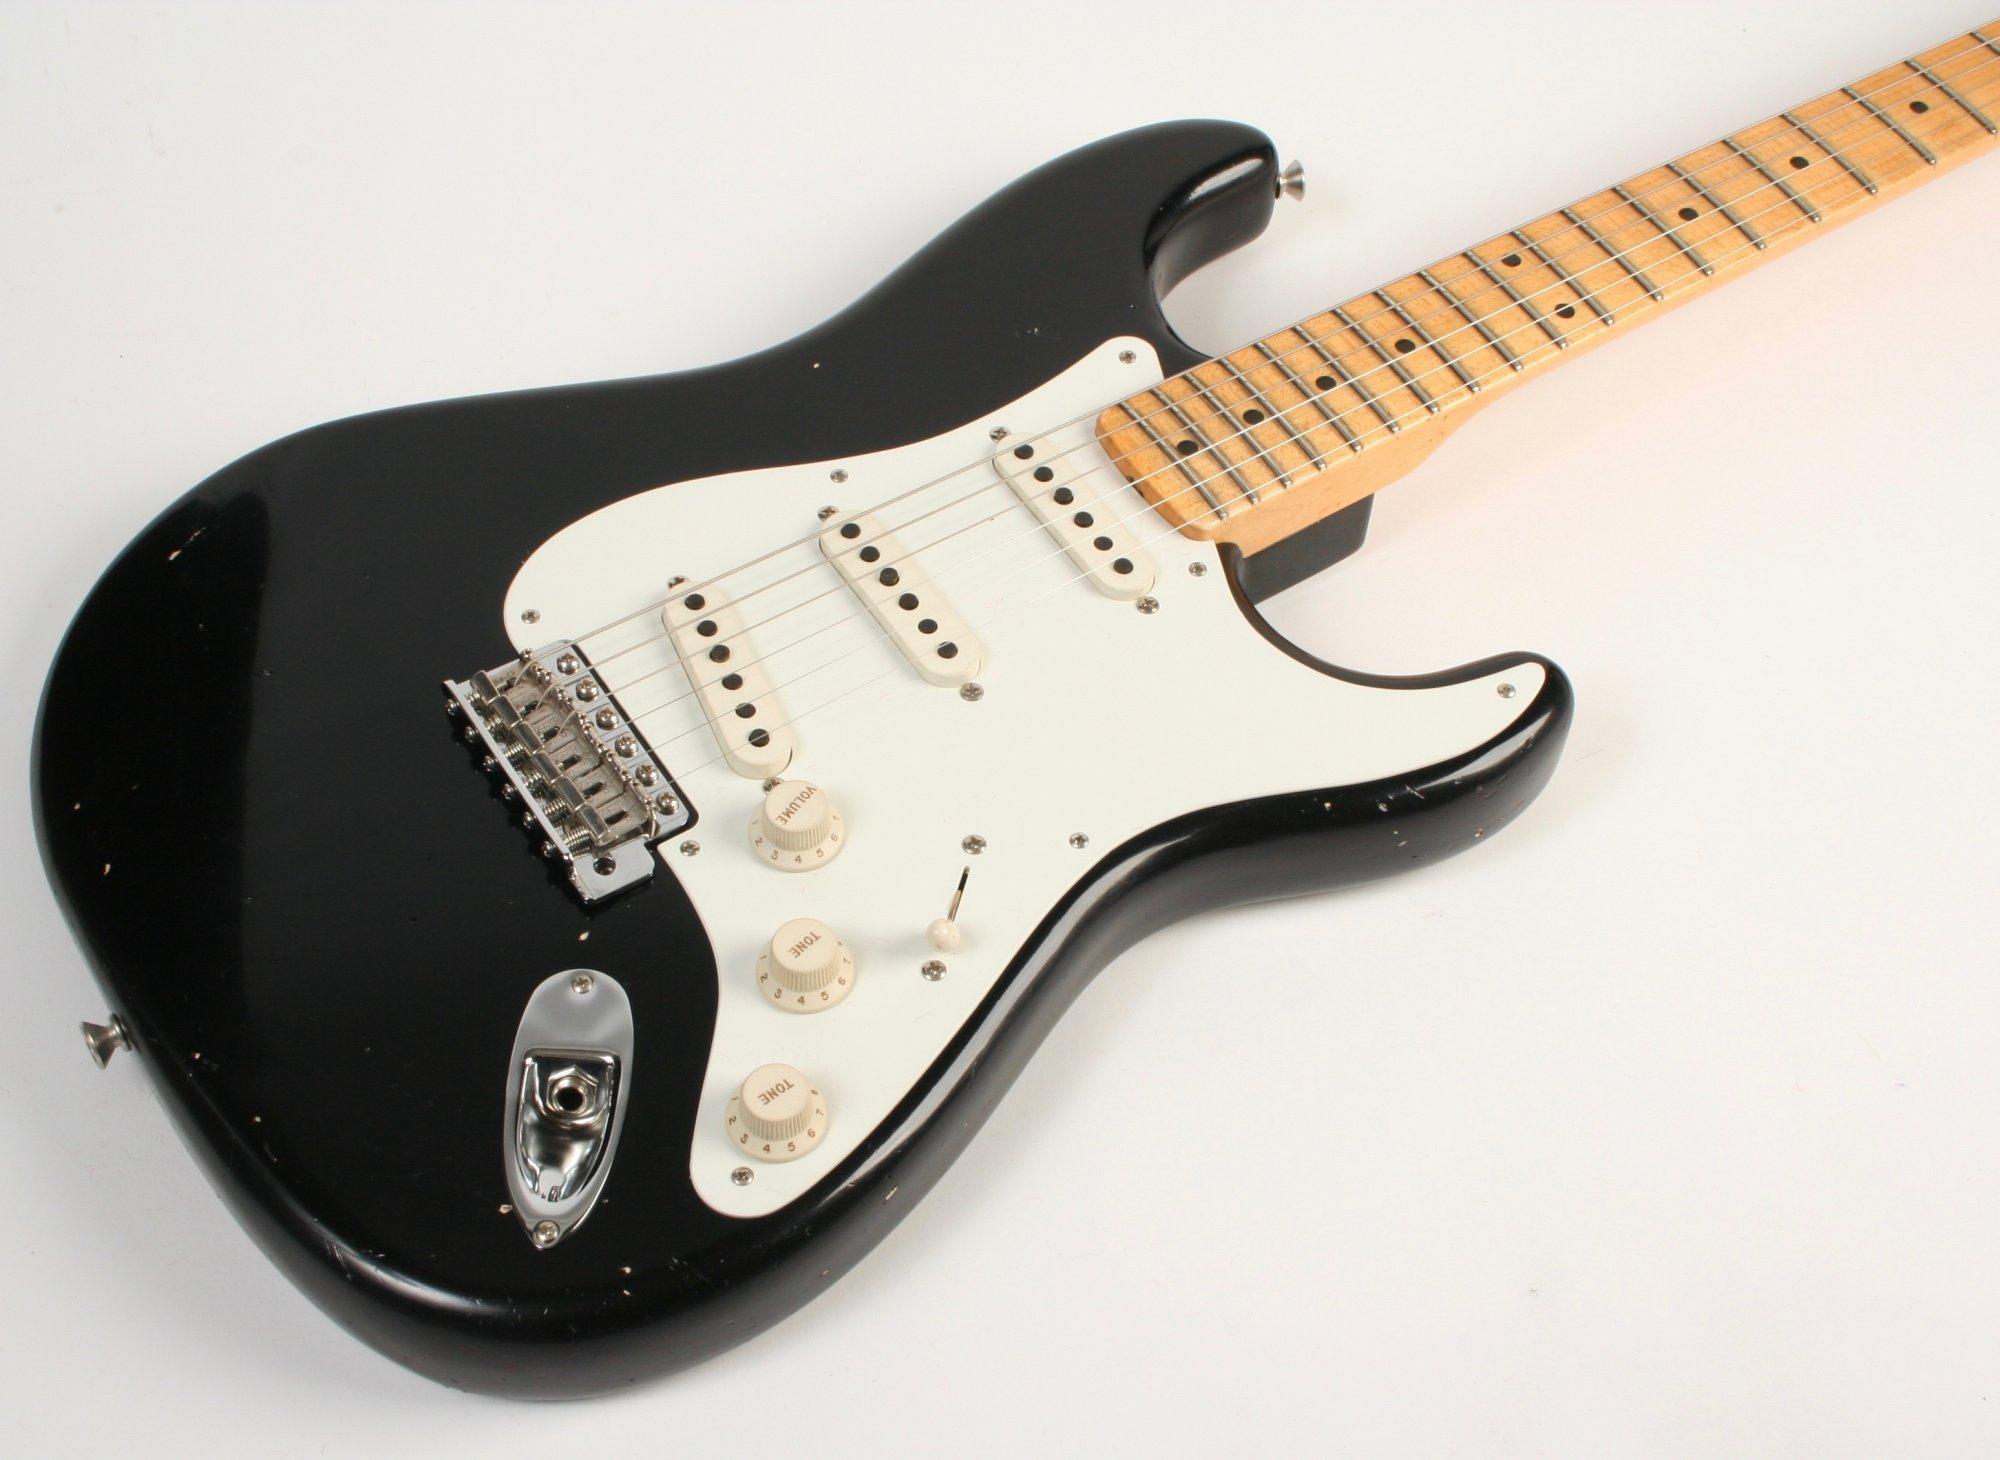 Fender Custom Shop Masterbuilt 1955 Stratocaster Journeyman Relic Black Dennis Galuszka MBDG